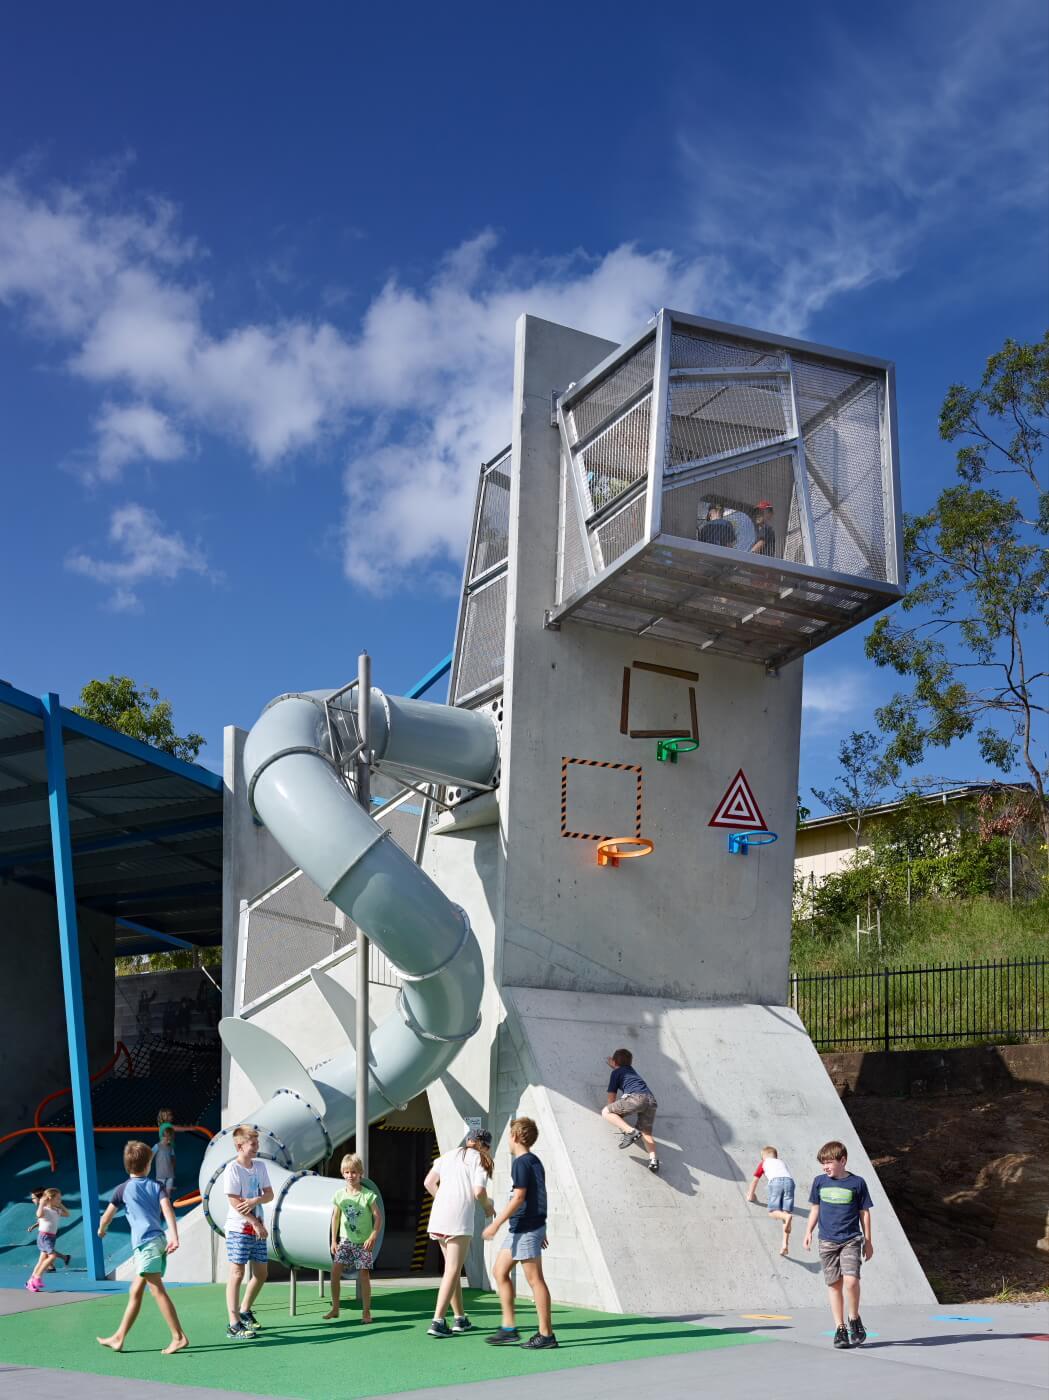 Frew-park-arena-playground-guymer-bailey-02.JPG